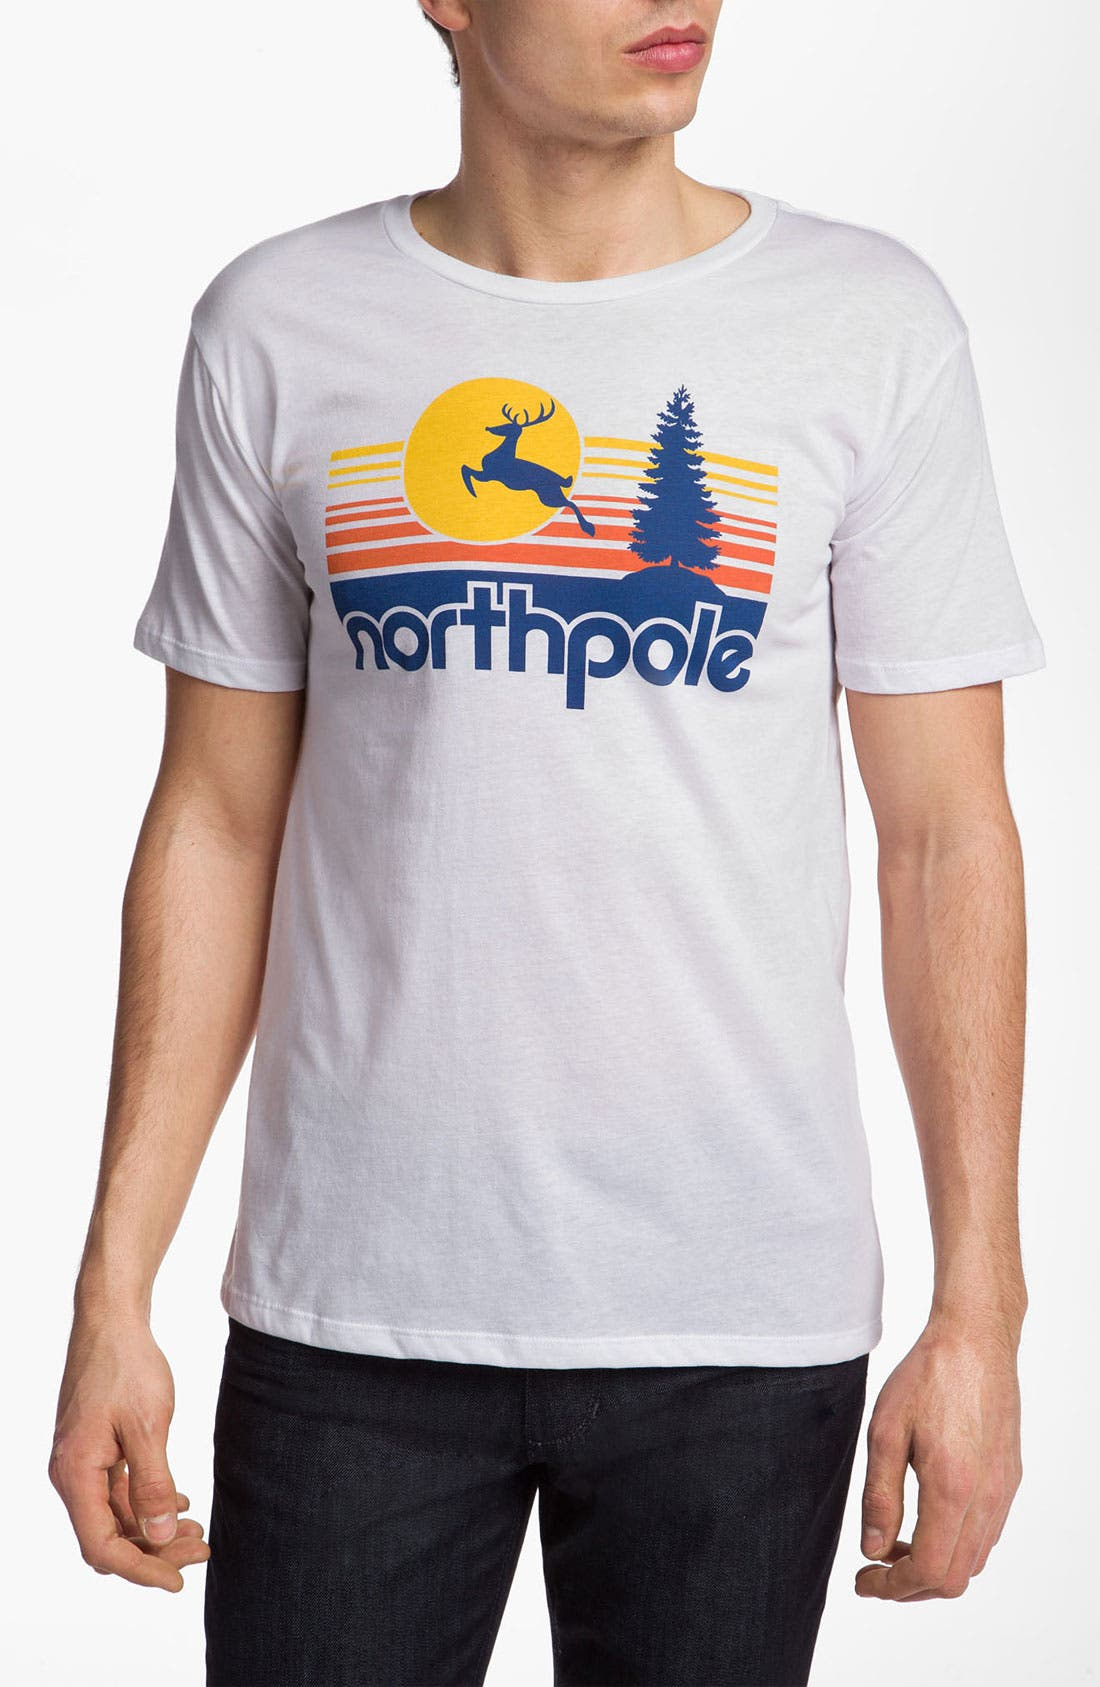 Main Image - Headline Shirts 'North Pole Vacation' T-Shirt